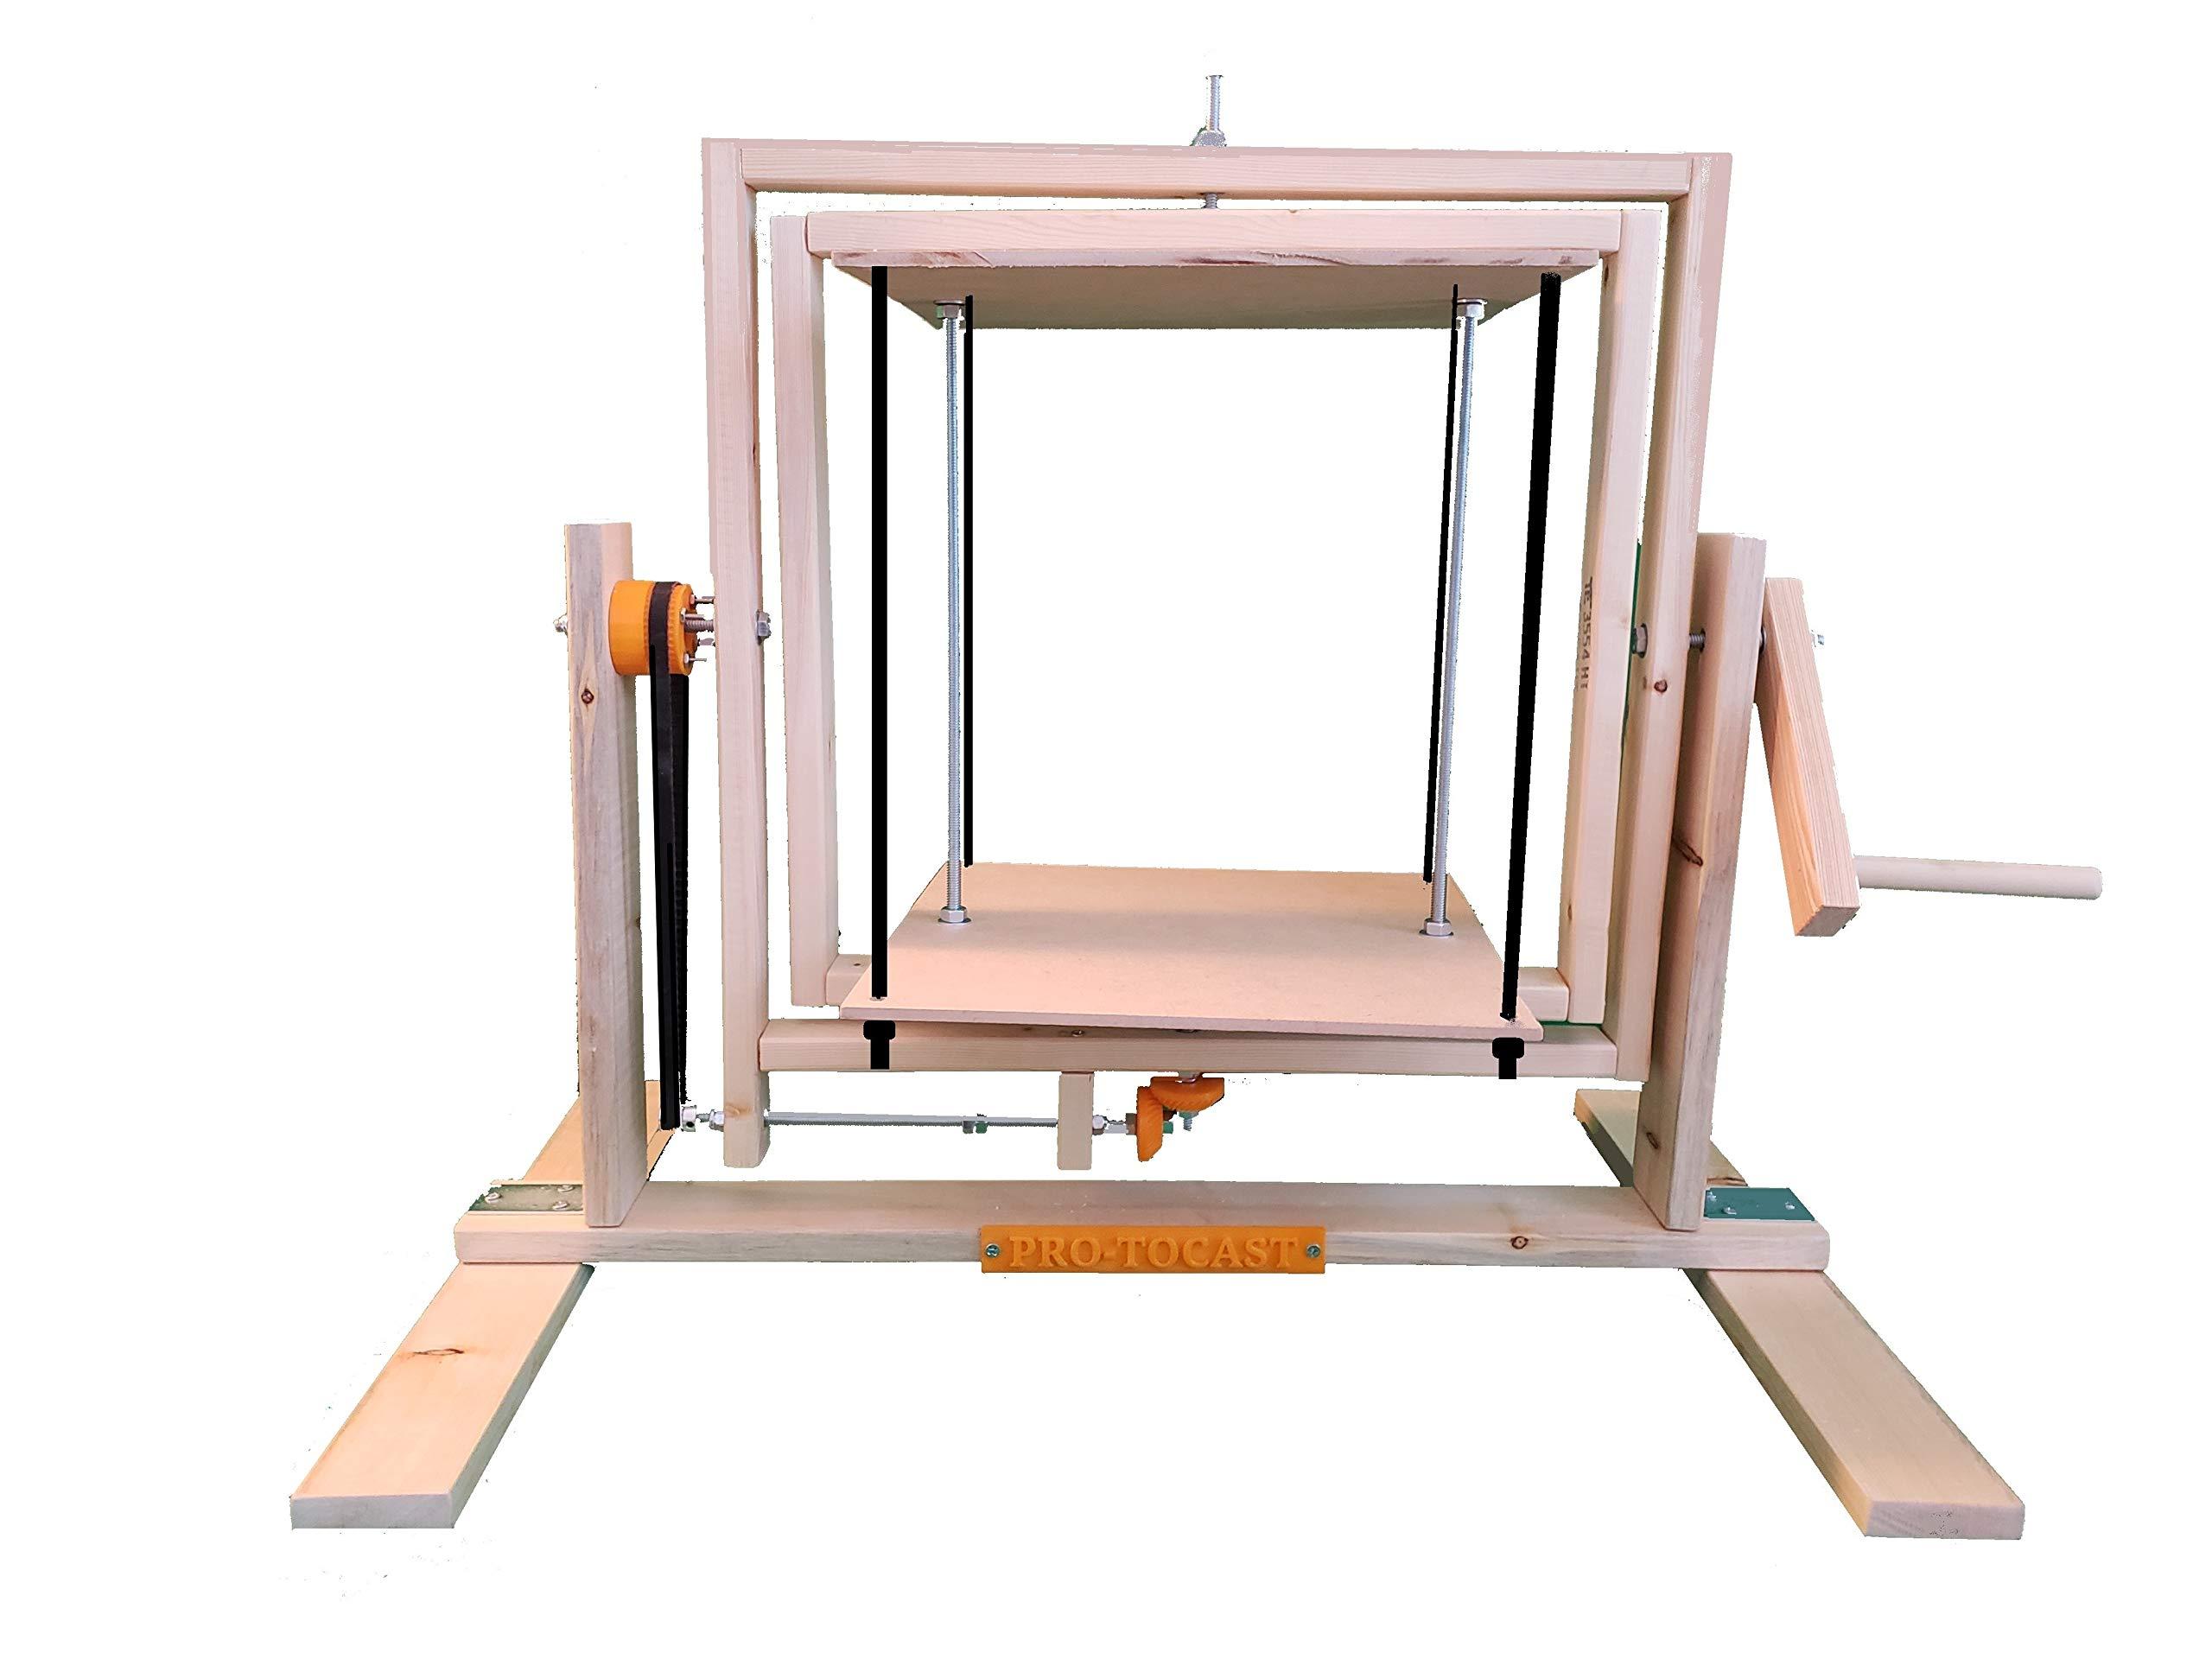 Pro-tocast 360 Multi-Directional Manual Rotocasting Machine w/ 12'' Platform - DIY